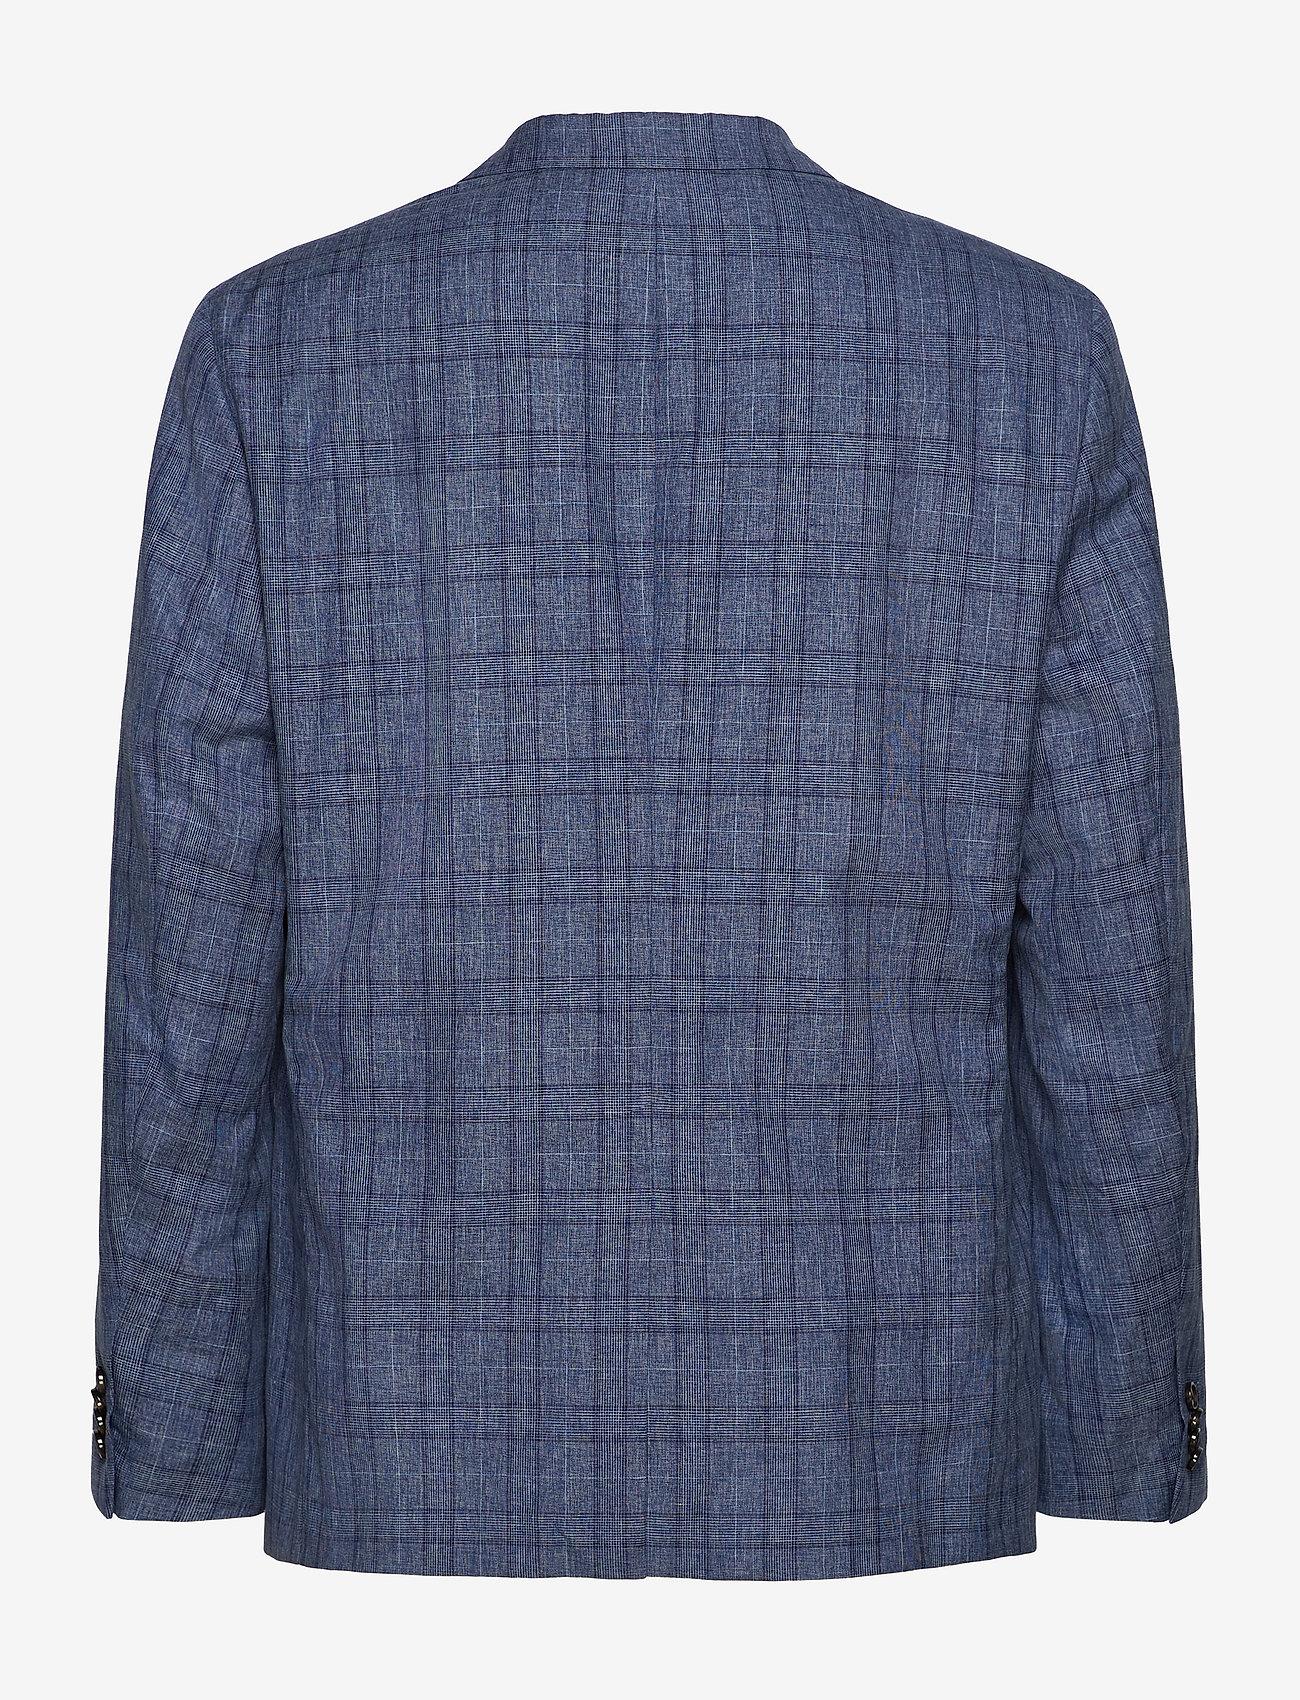 Banana Republic Slim Italian Wool-cotton Blazer - Suits & Blazers